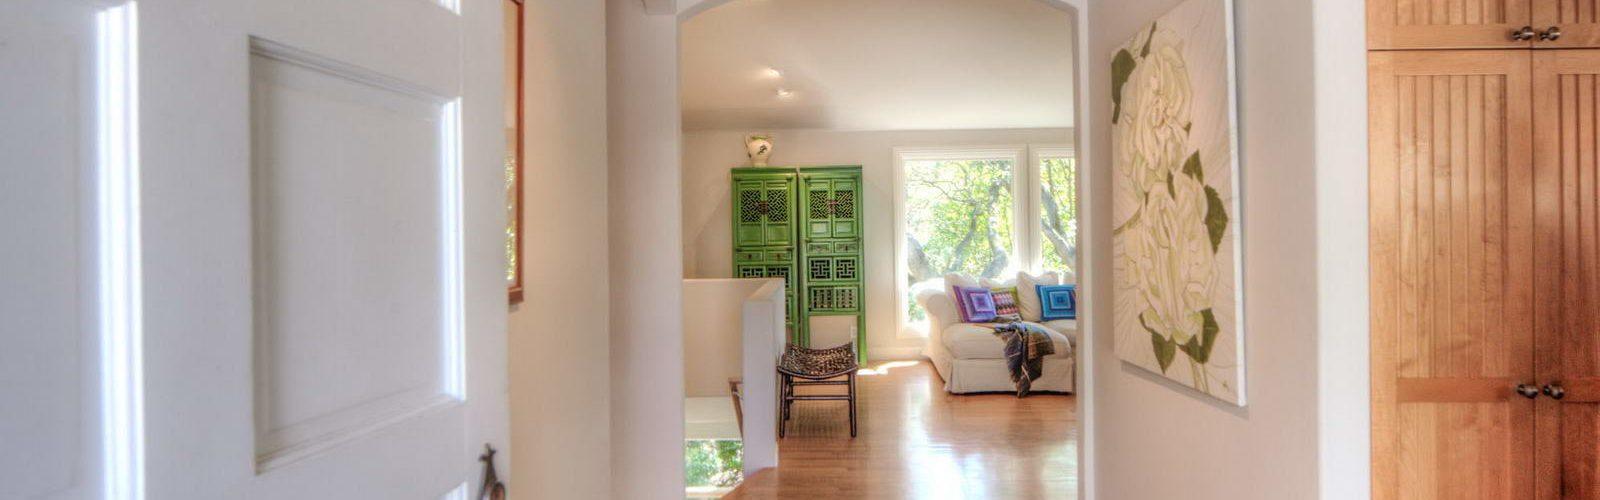 maison-familiale-calme-lumineuse-verdure-san-rafael-une